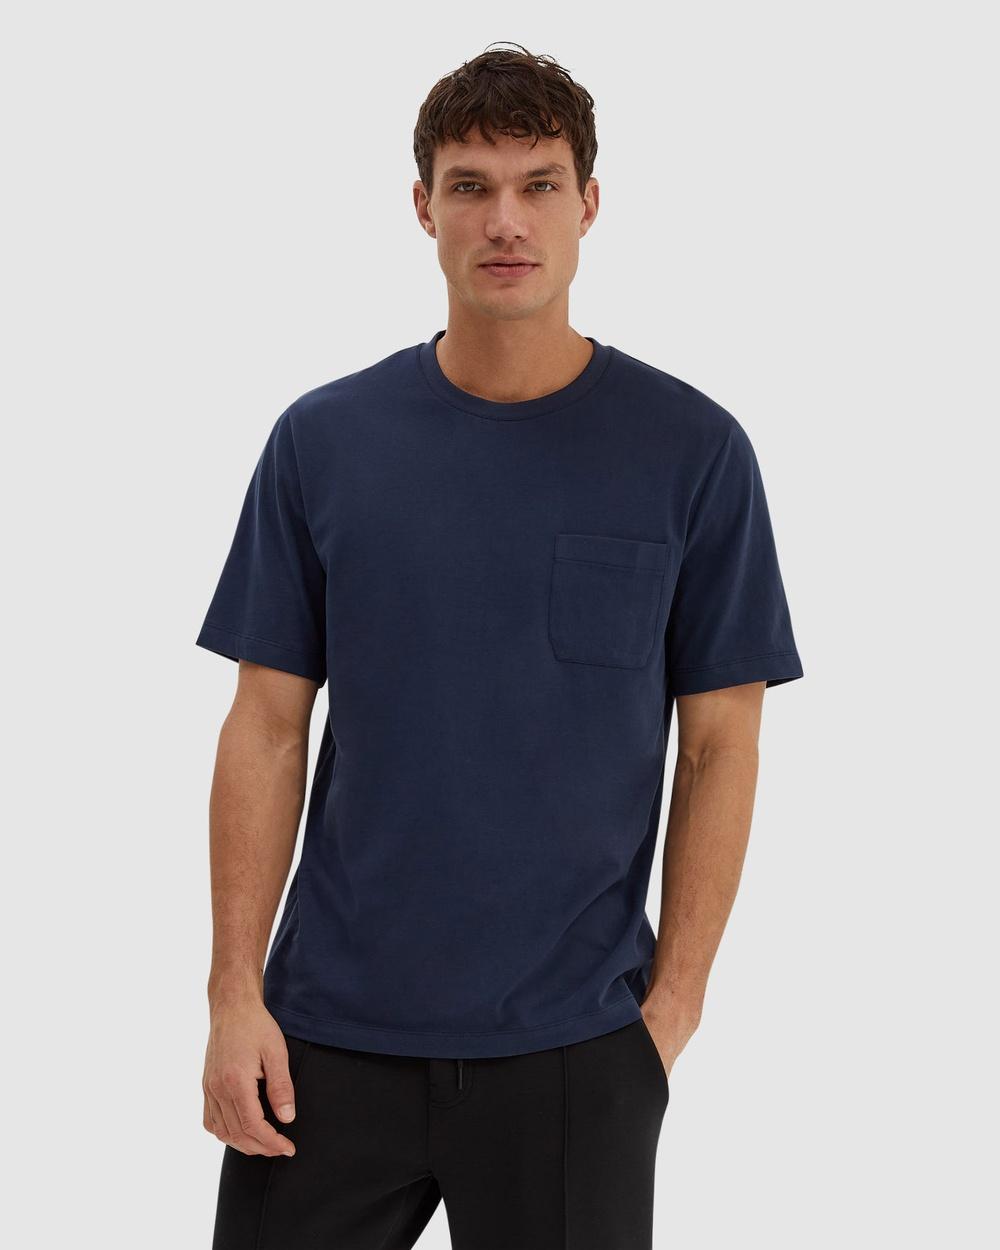 SABA - SB Walker Short Sleeve Super Soft Tee - T-Shirts & Singlets (French Navy) SB Walker Short Sleeve Super Soft Tee